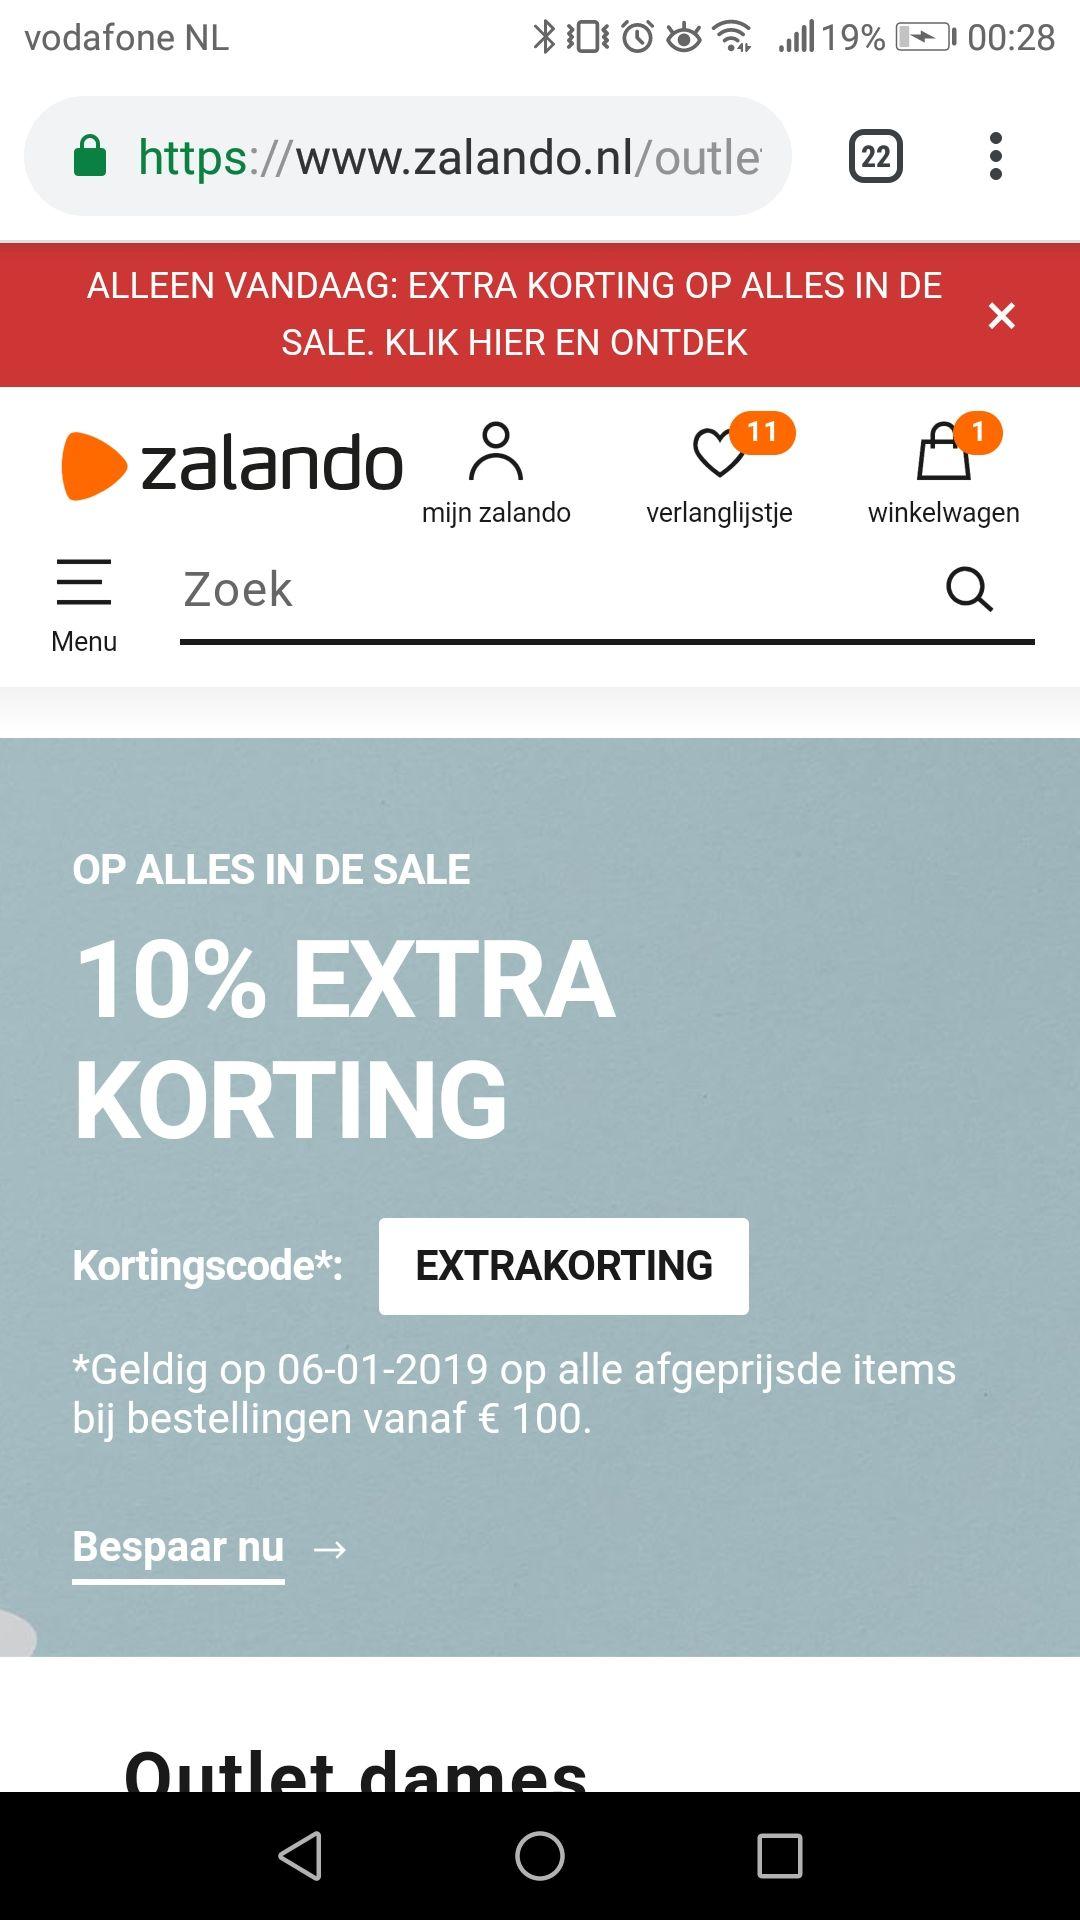 Zalando 10% extra korting